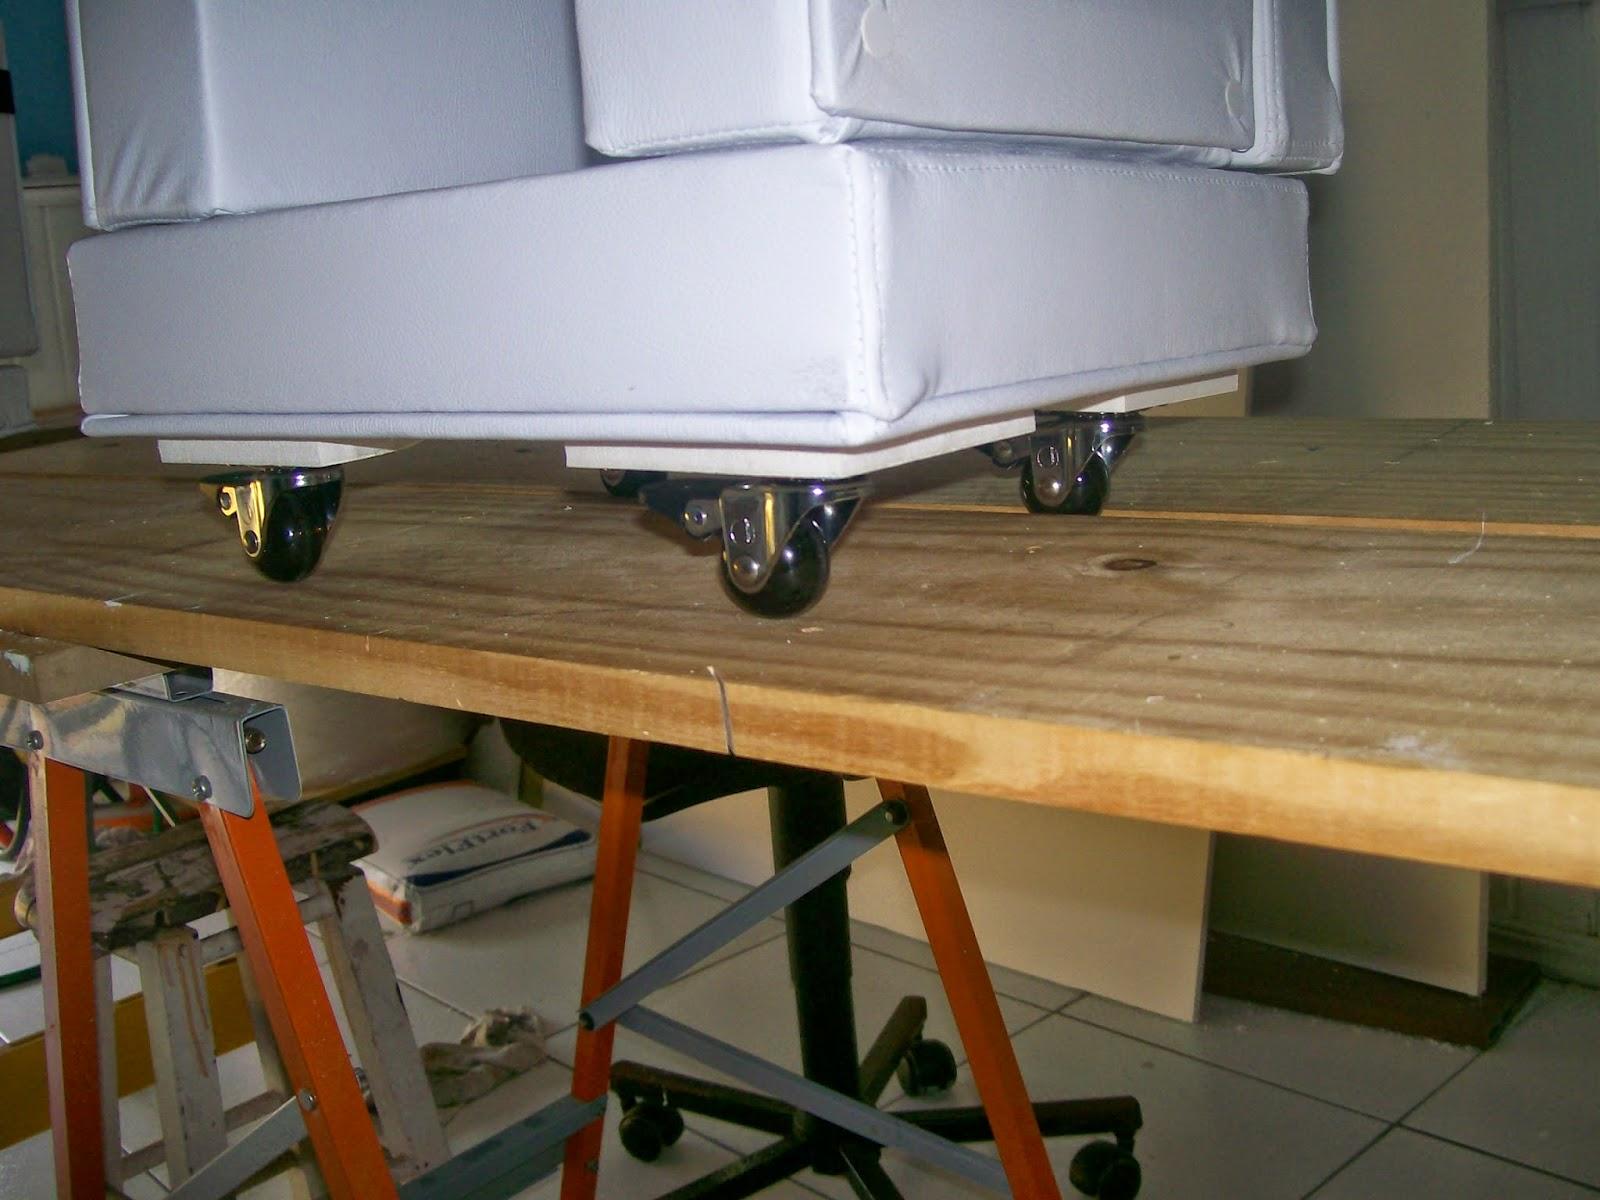 cadeira movel para megaesofago